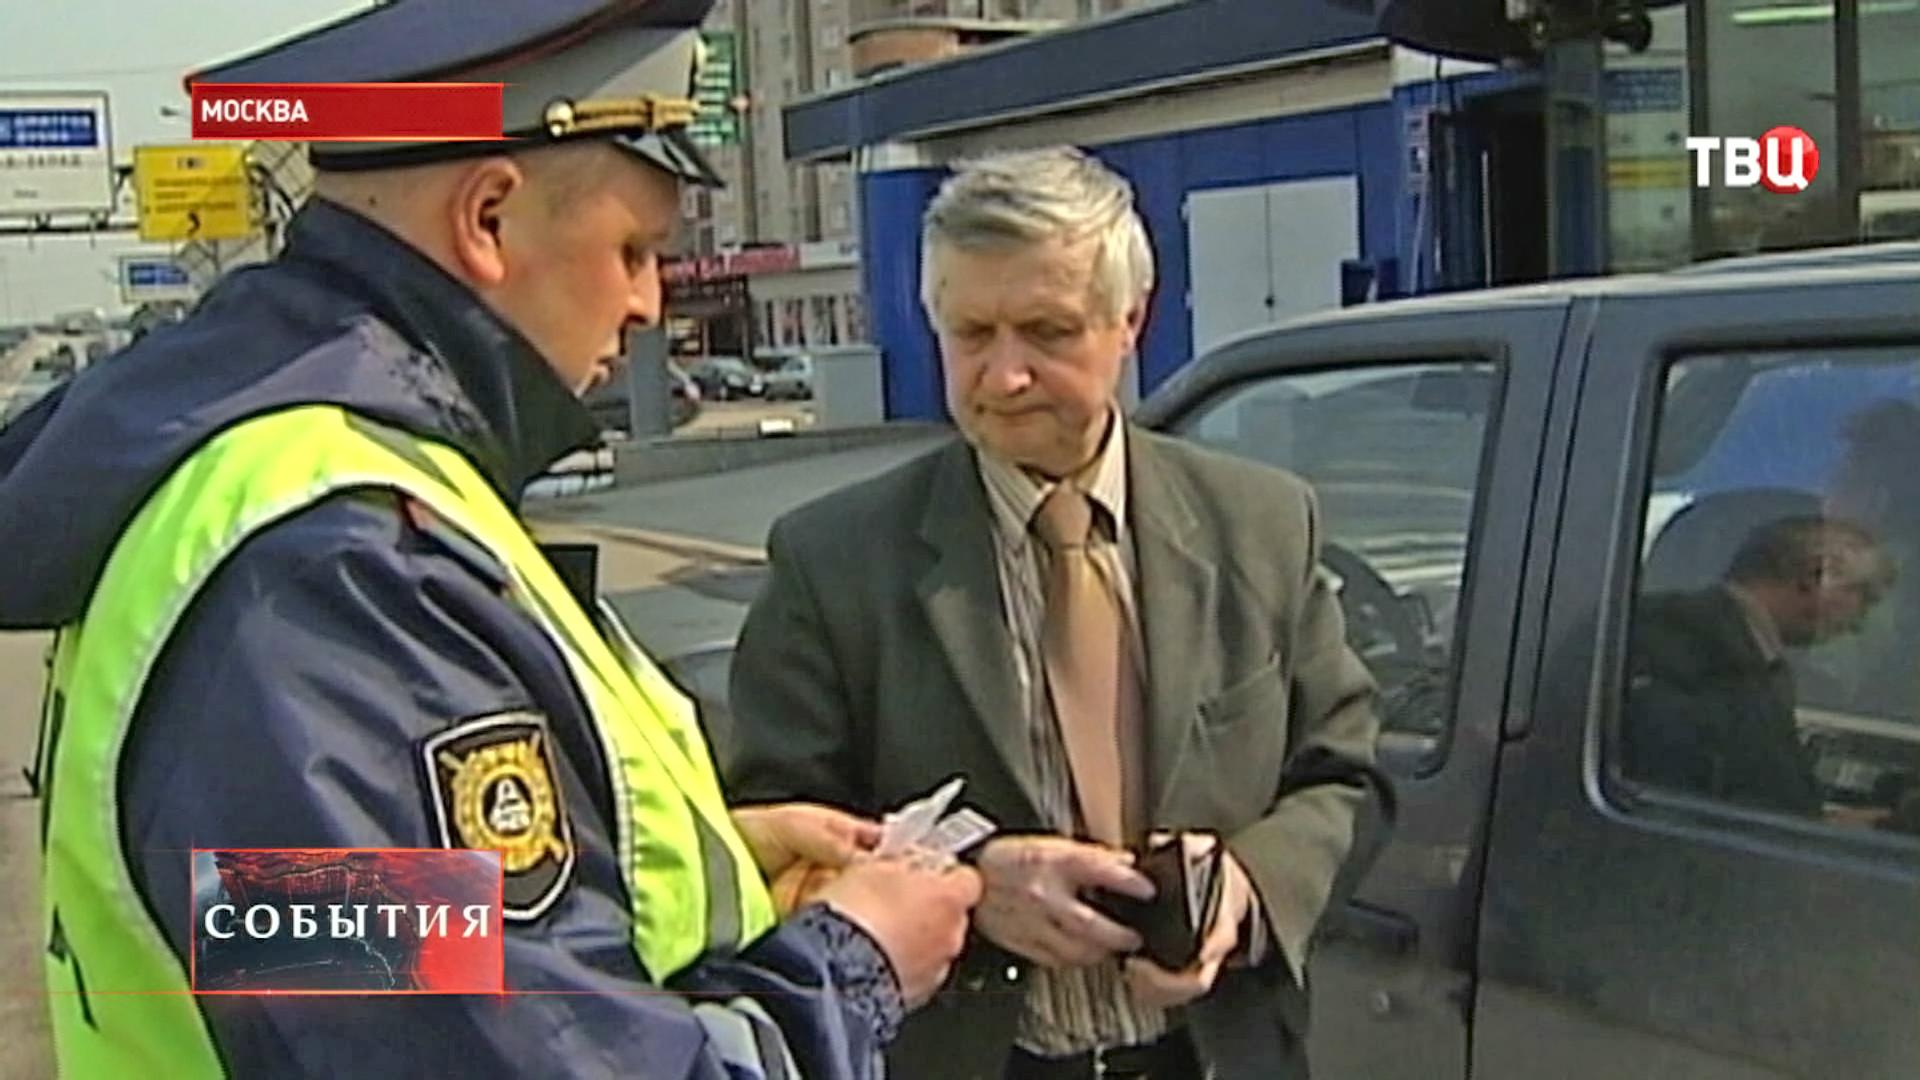 Инспектор ГИБДД остановил нарушителя ПДД